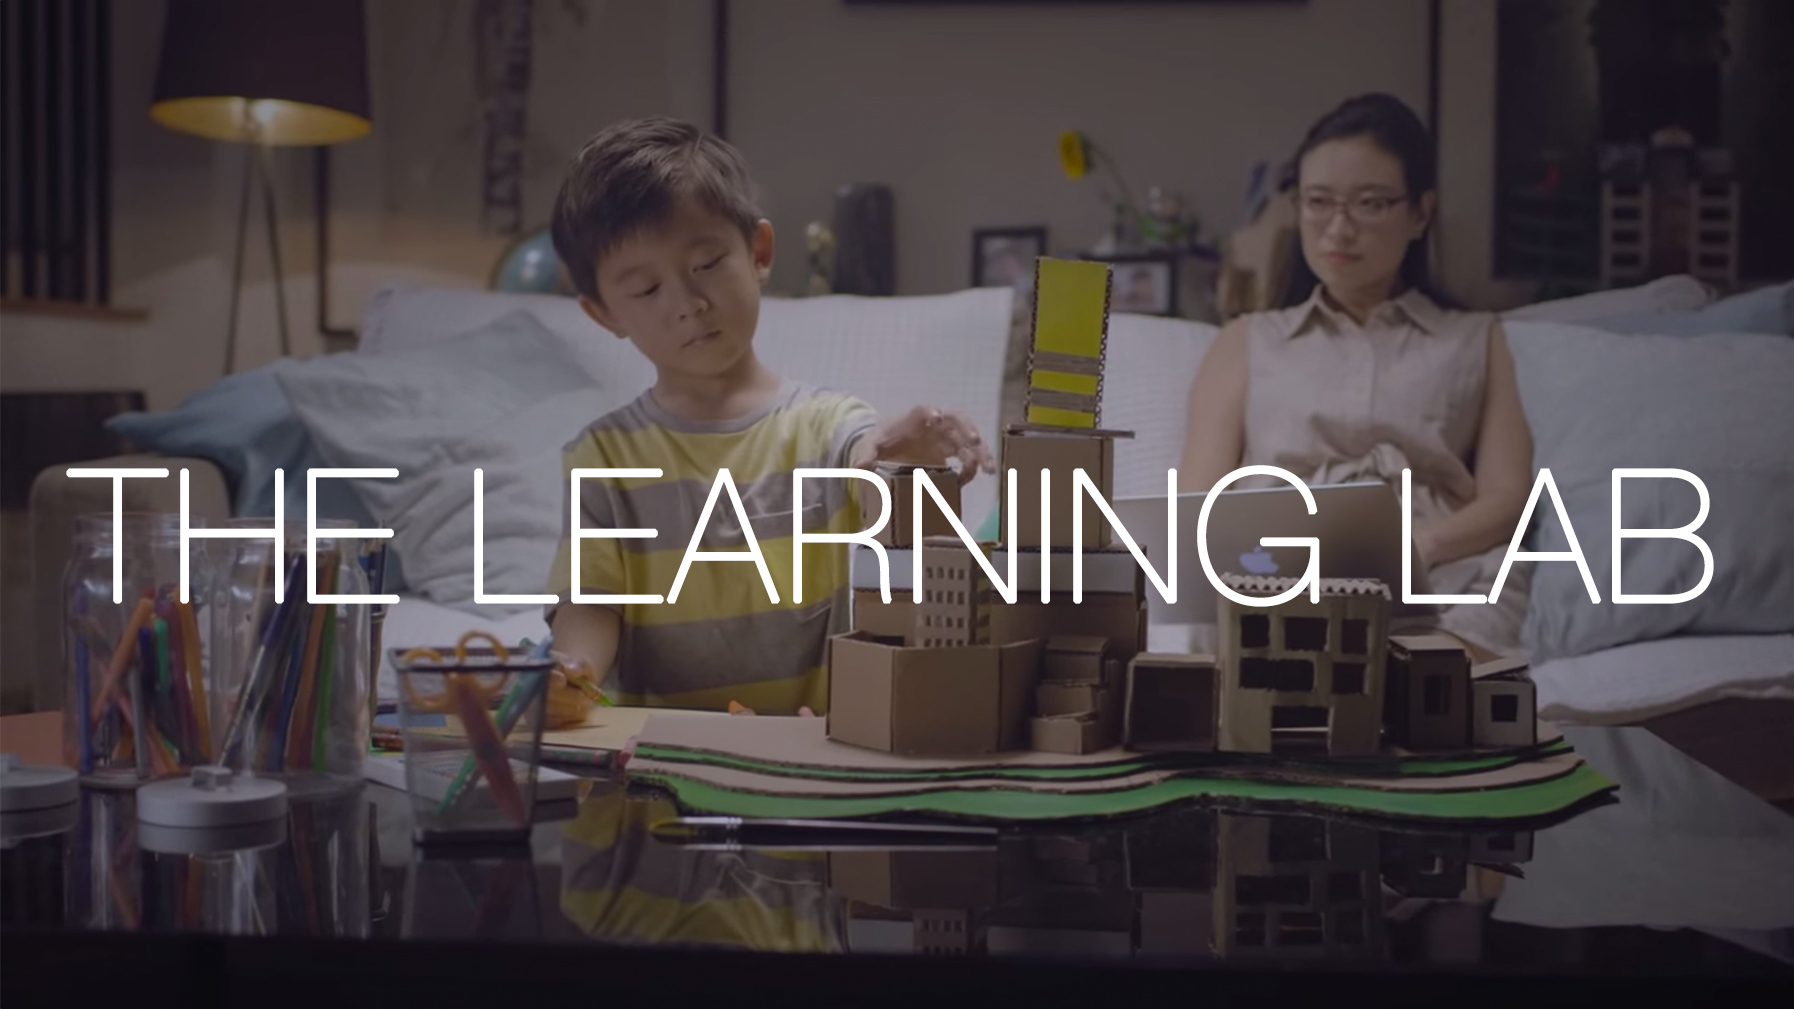 Thelearninglab2.jpg